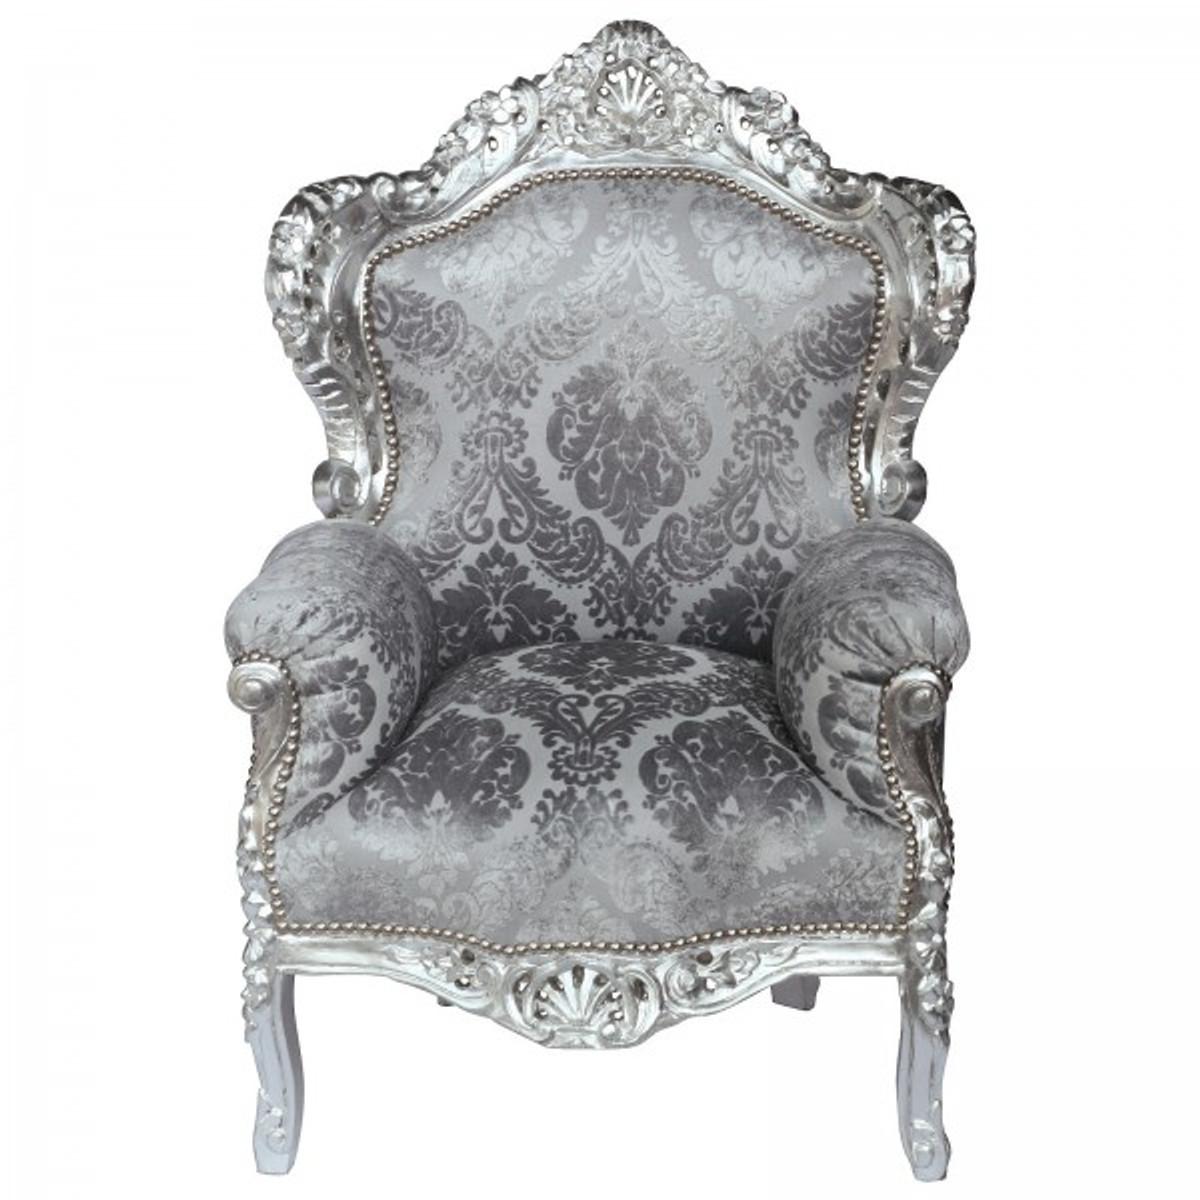 Vintage Thron Sessel Samt Musterstoff Relief Grau Silber Holzrahmen